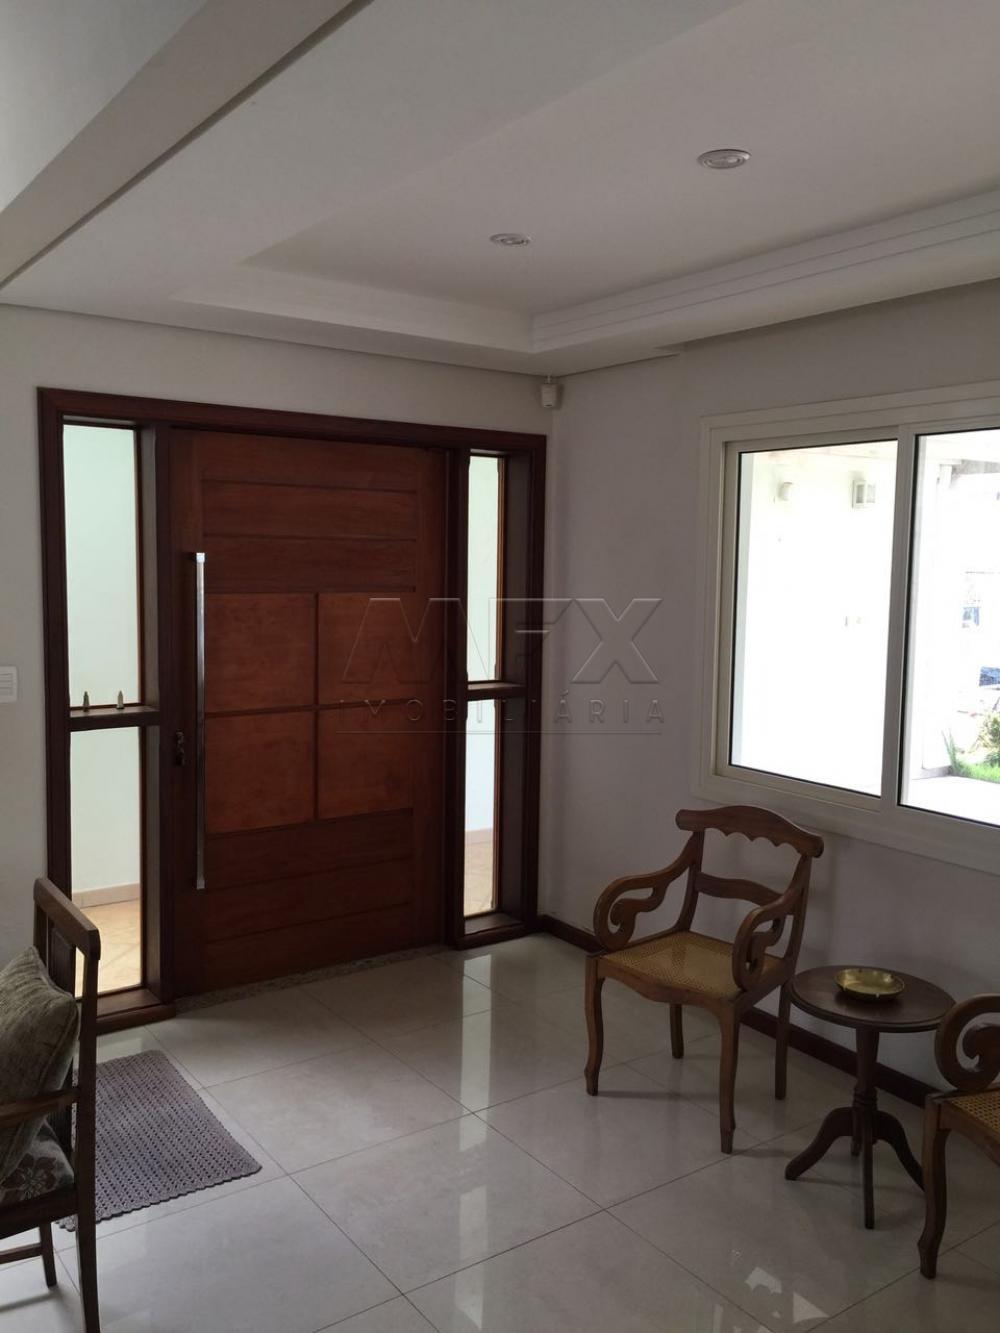 Alugar Casa / Condomínio em Bauru R$ 7.000,00 - Foto 3